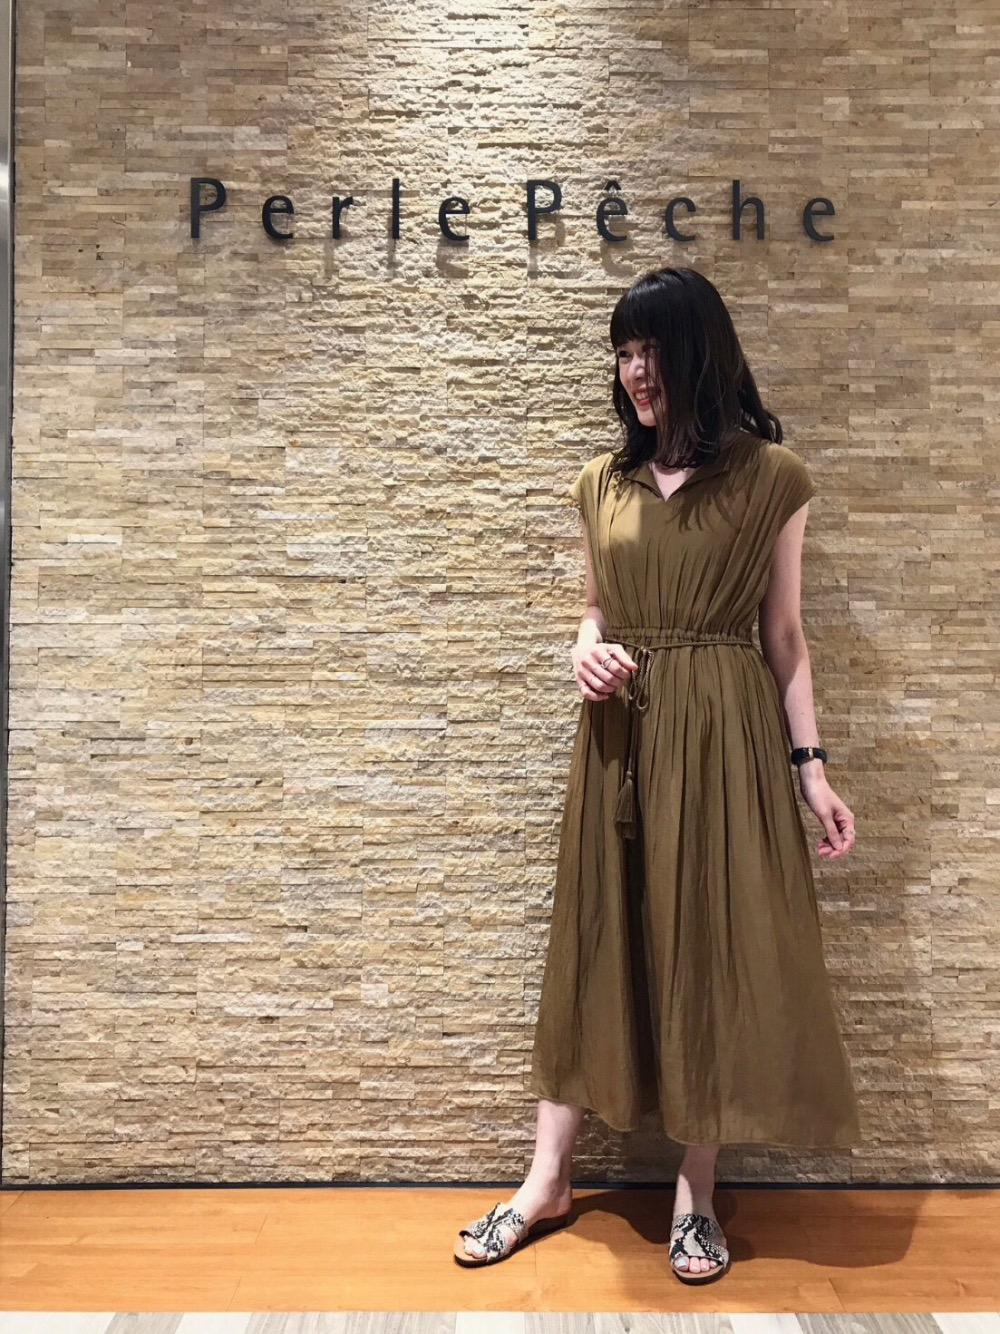 Perle Pecheアミュプラザ博多店